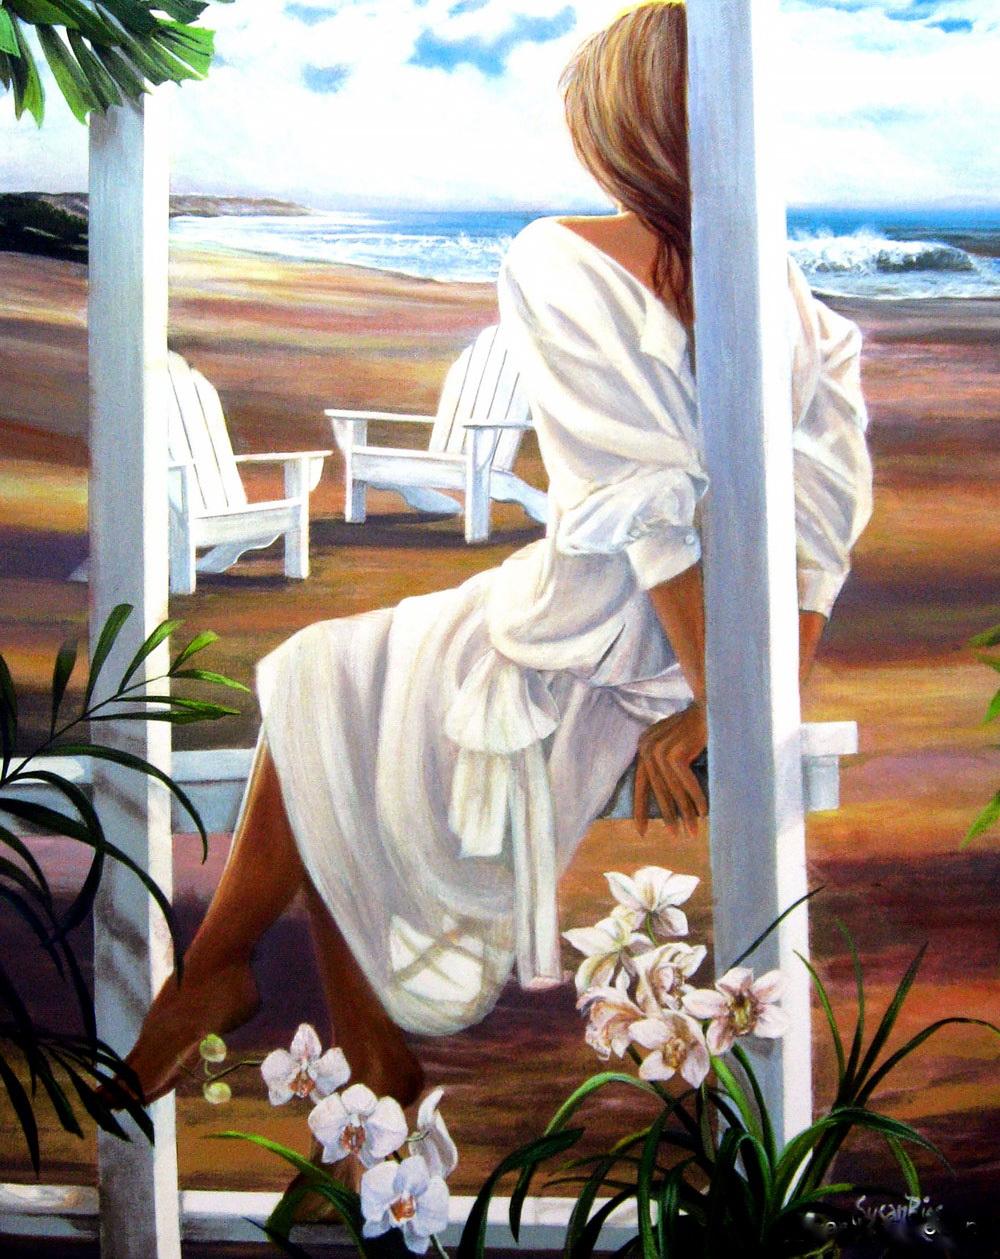 Susan-RIOS-_-Summer-Breeze---Catherine-La-Rose-12.jpg